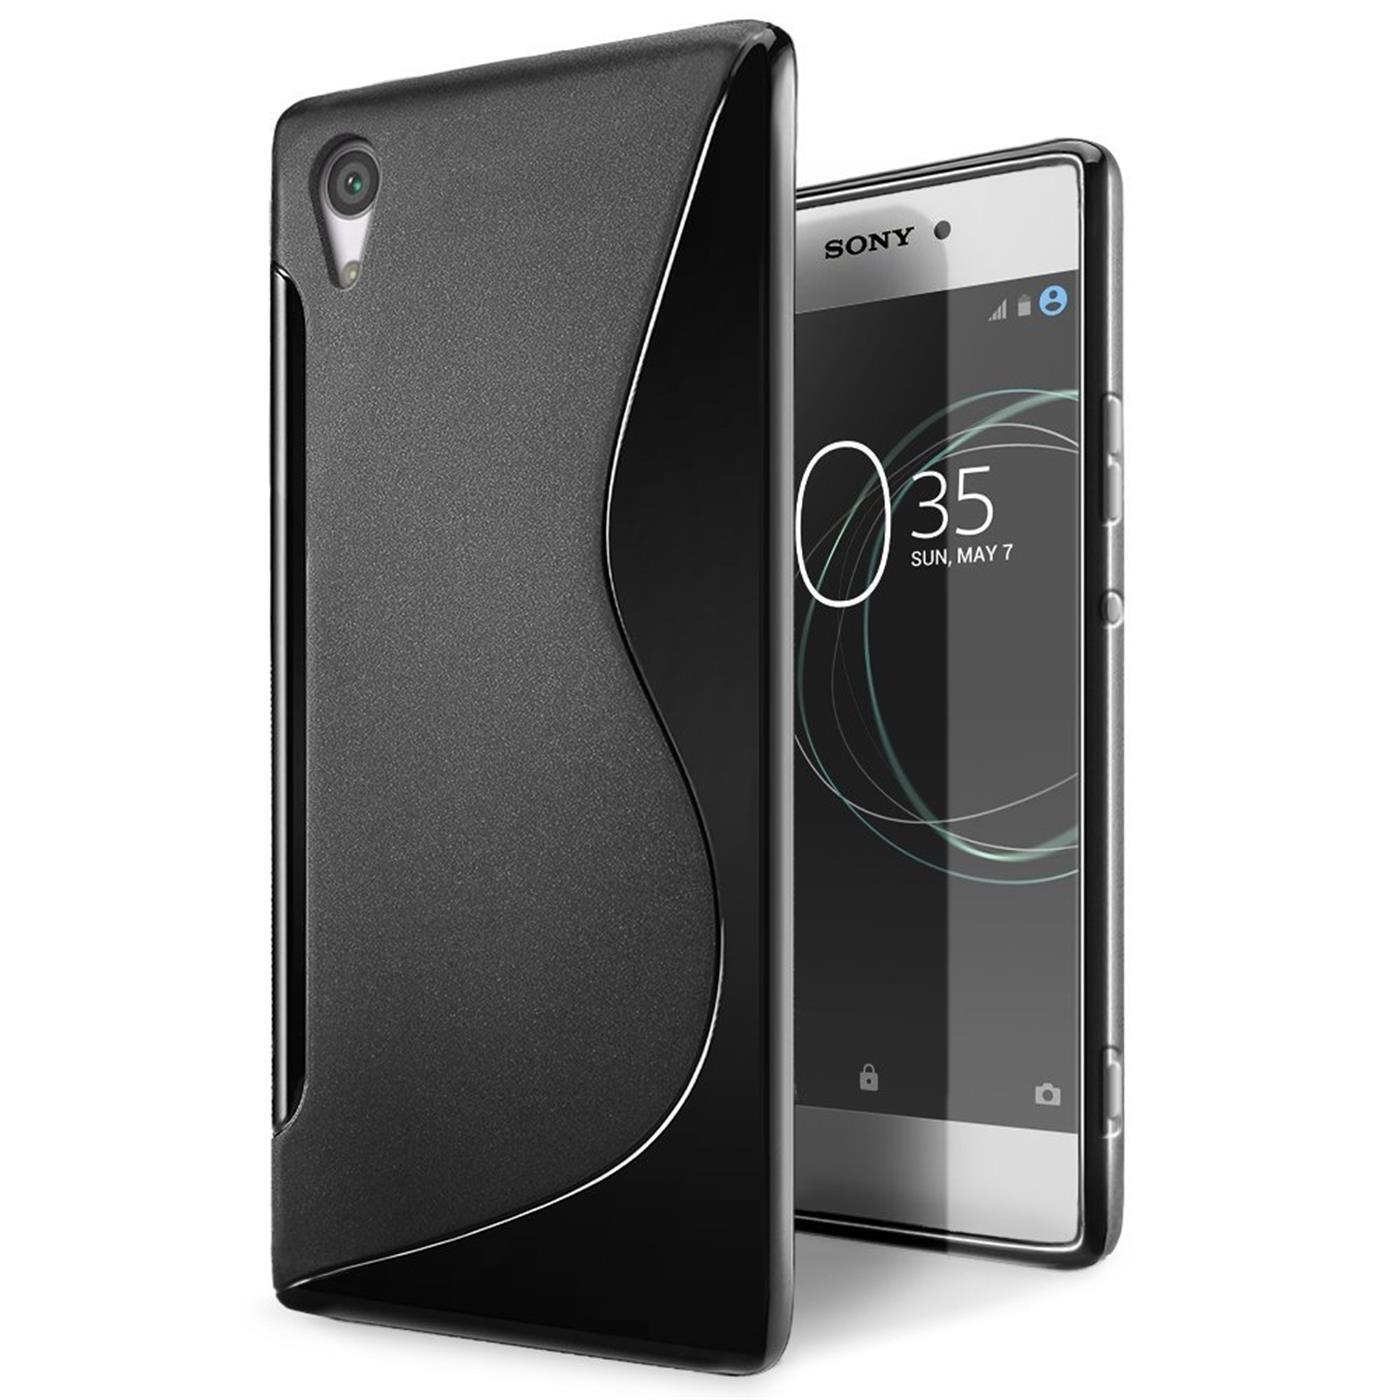 Sony-Xperia-X-Silikon-Gel-S-Line-Case-Cover-Ultra-Thin-Slim-Back-Bumper Indexbild 21